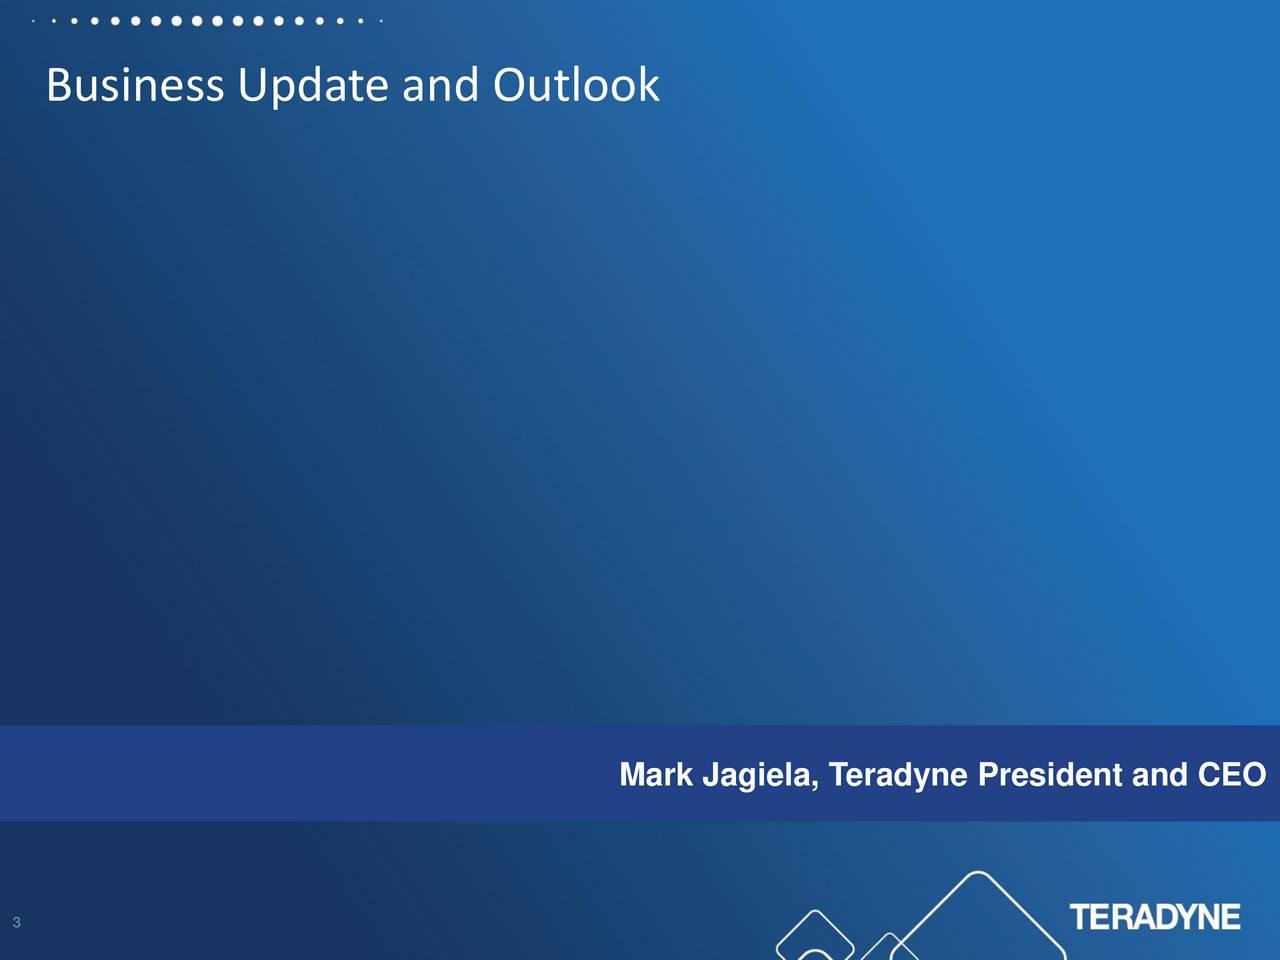 Mark Jagiela, Teradyne President and CEO 3